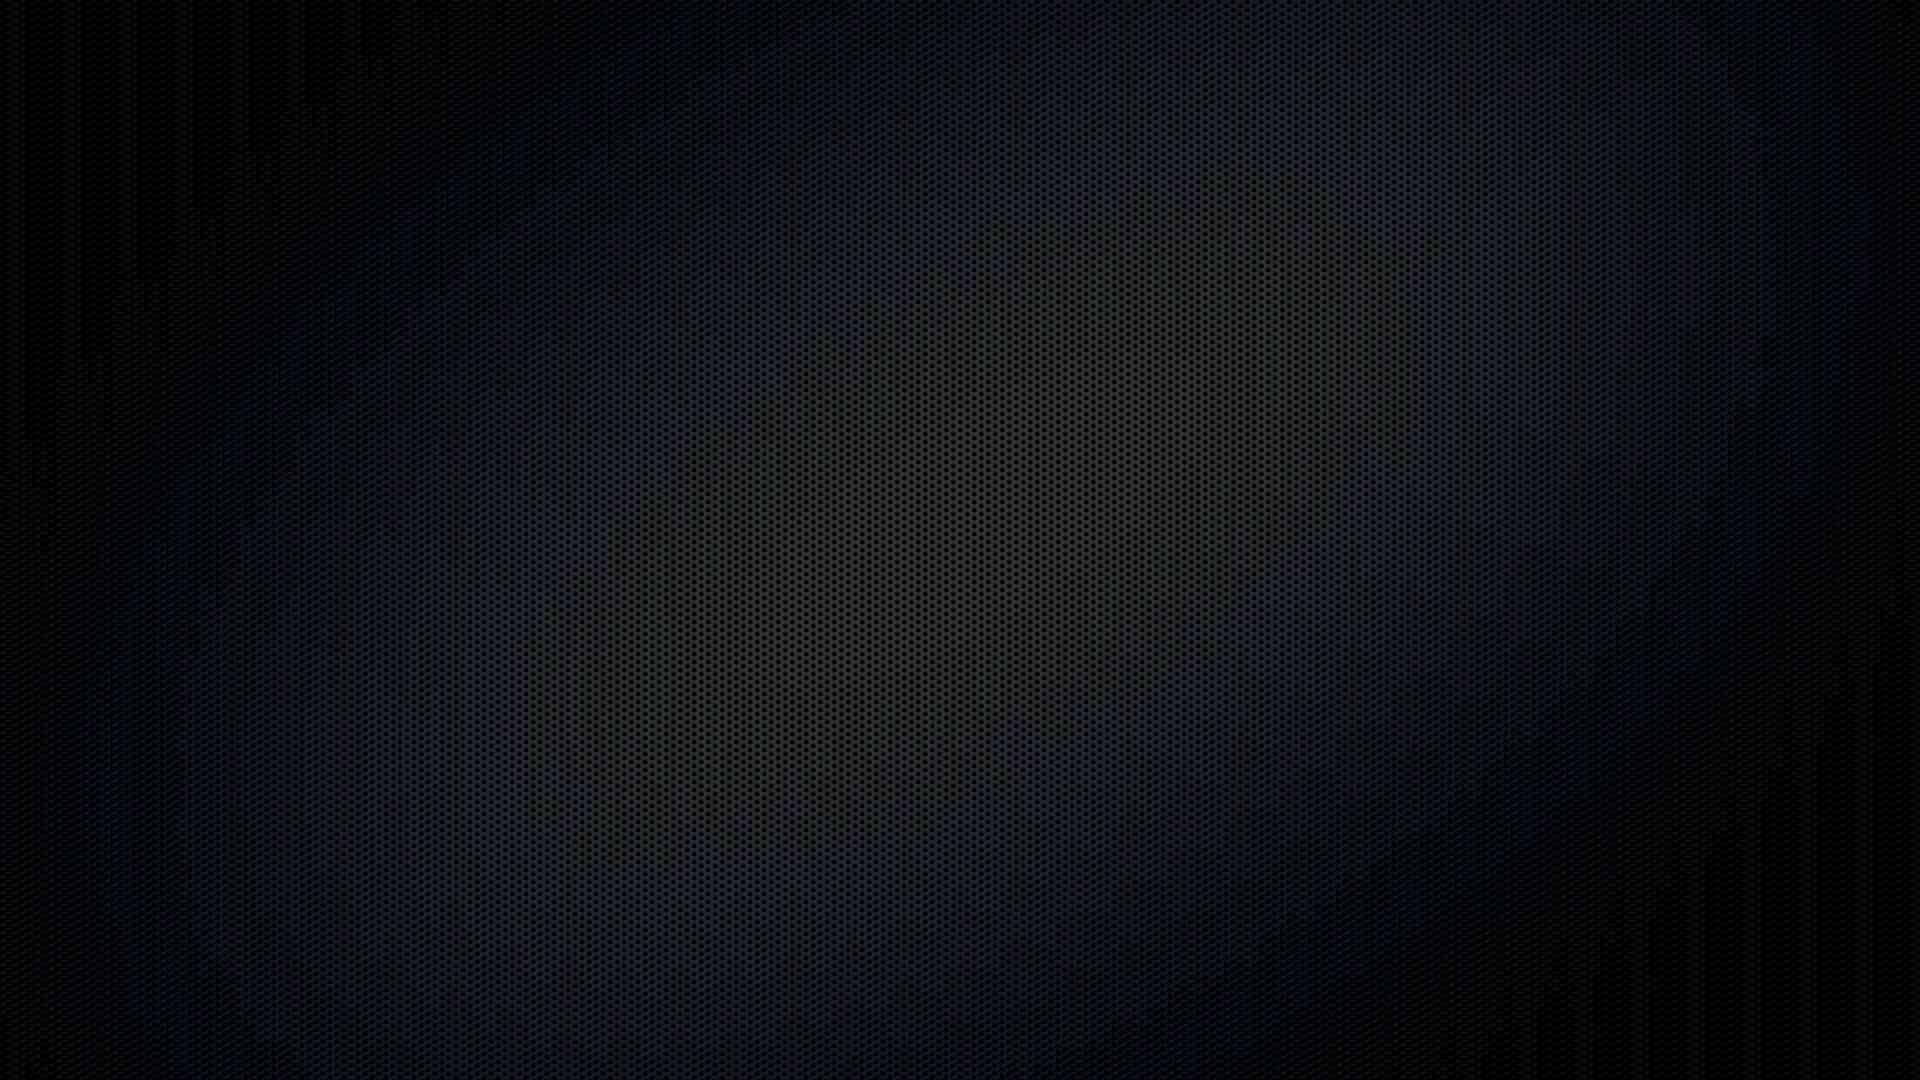 black-pattern-1920×1080.jpg